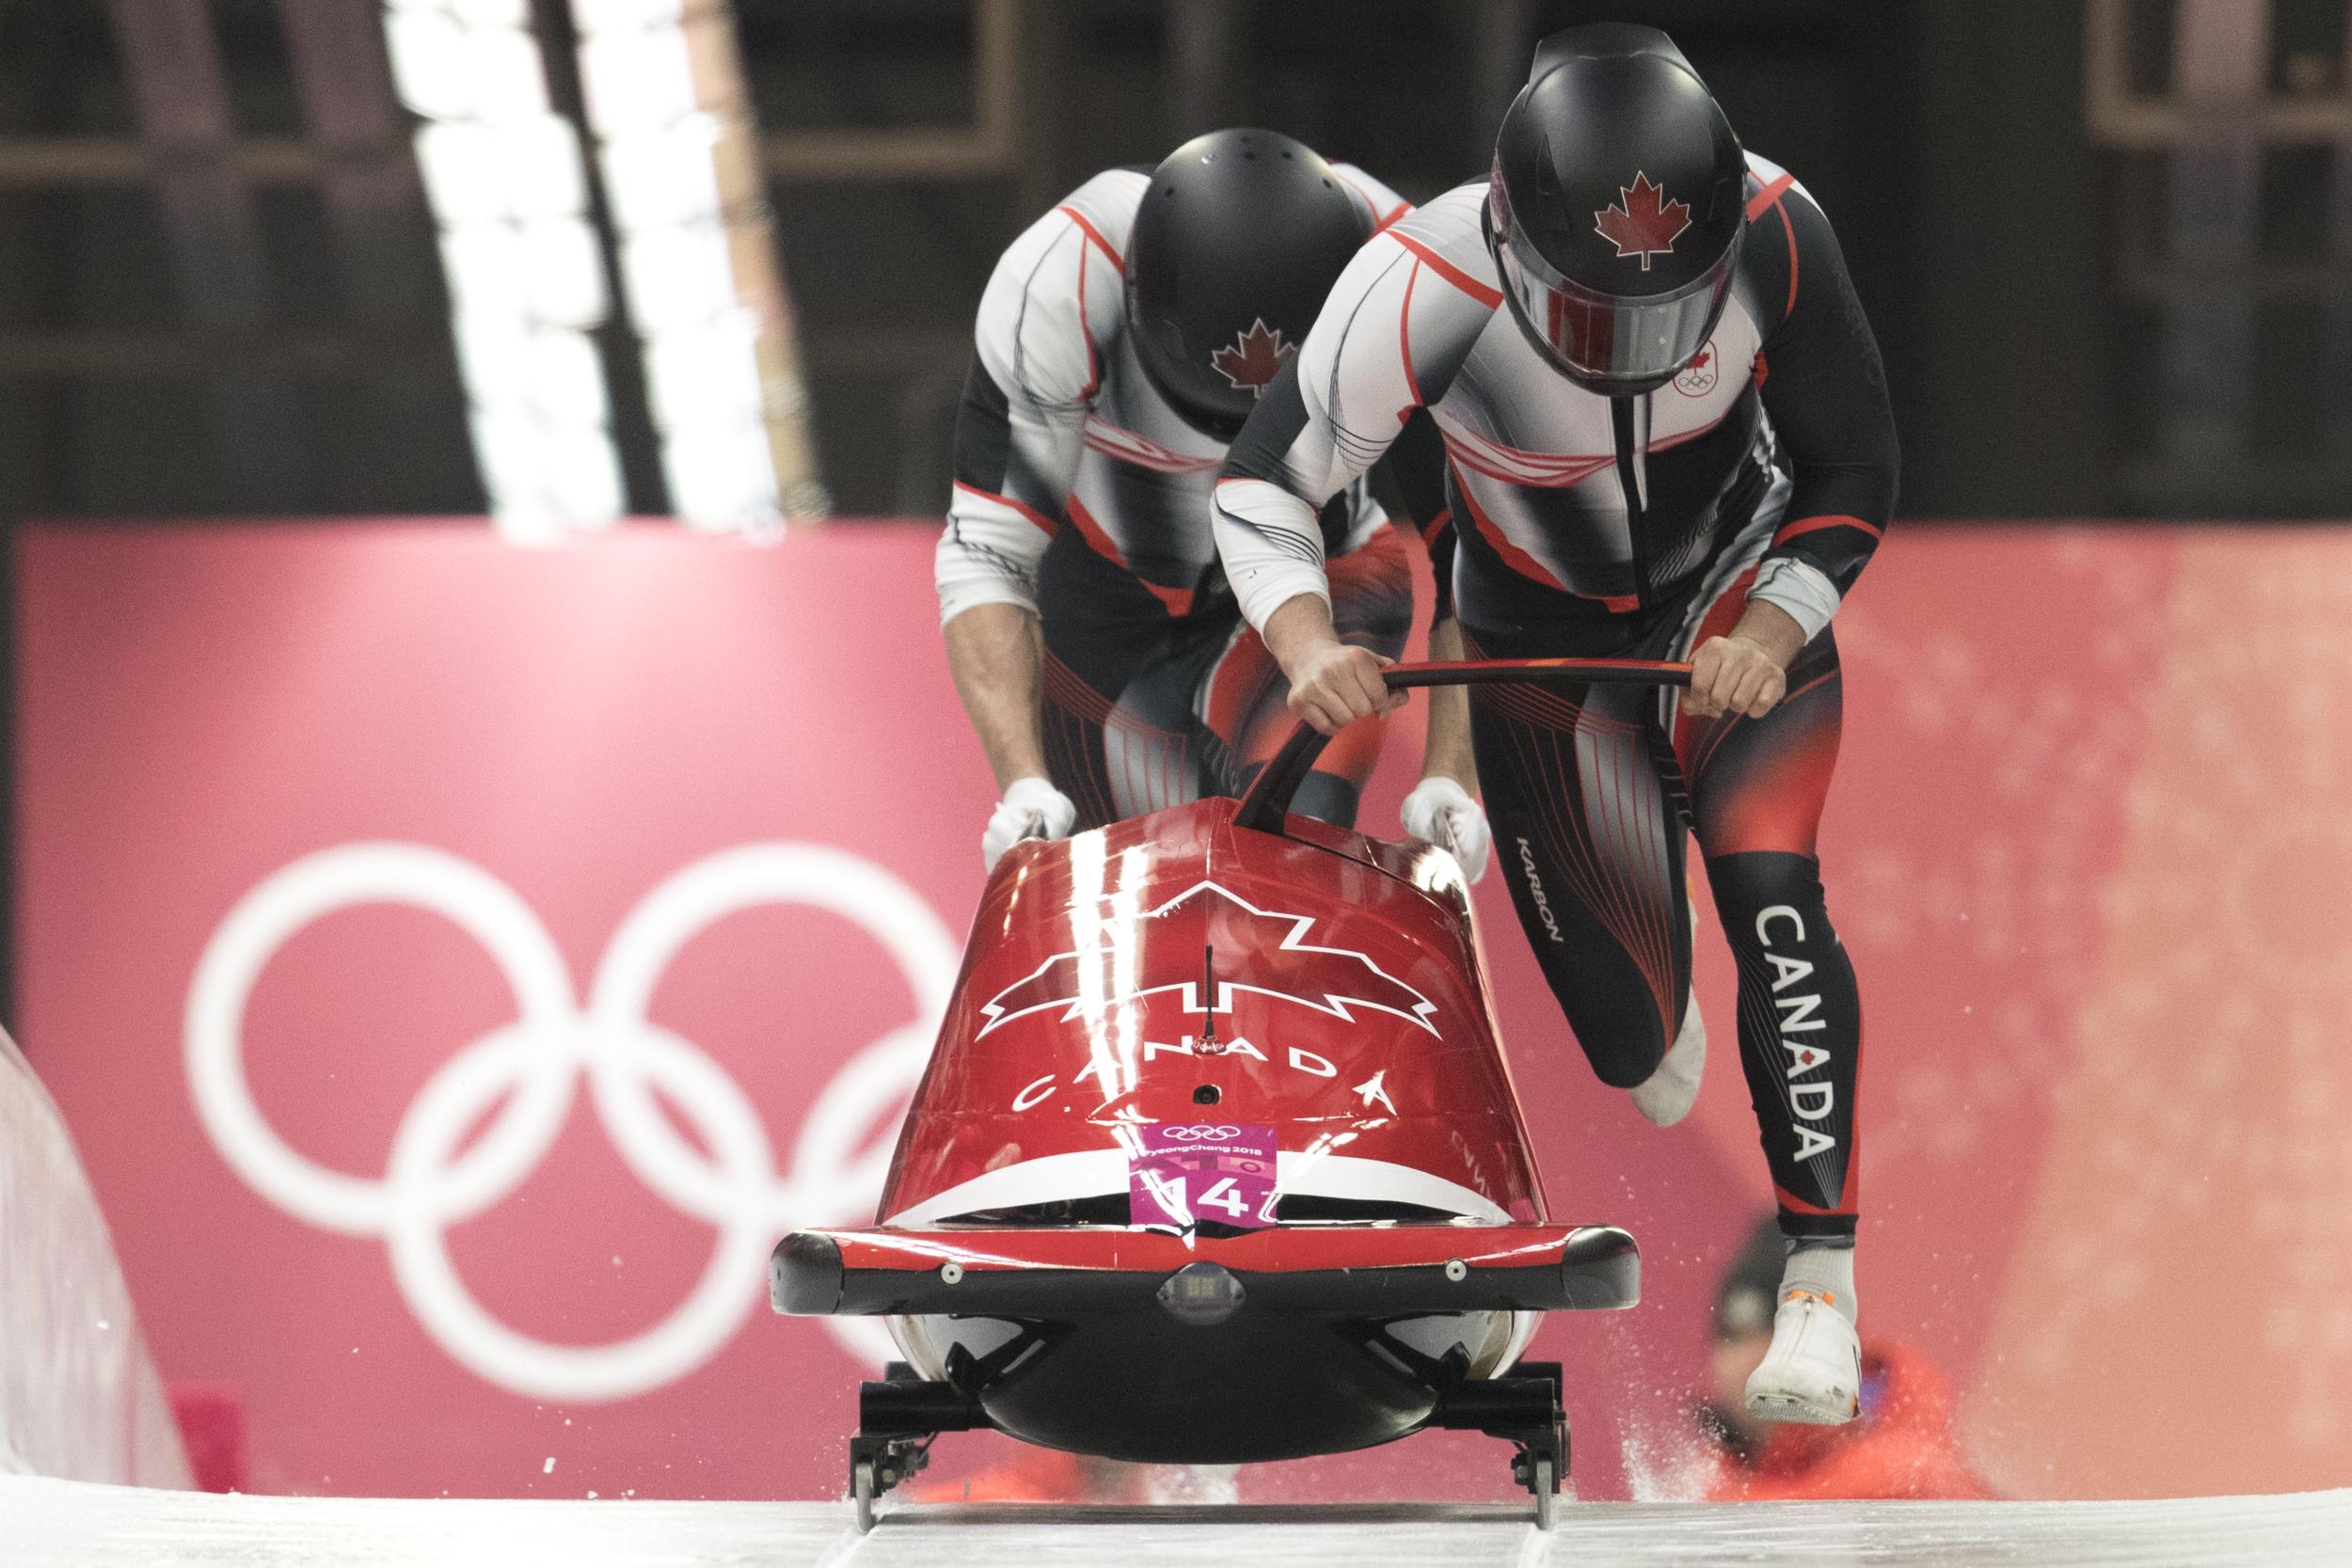 Bobsledders push two-man sled